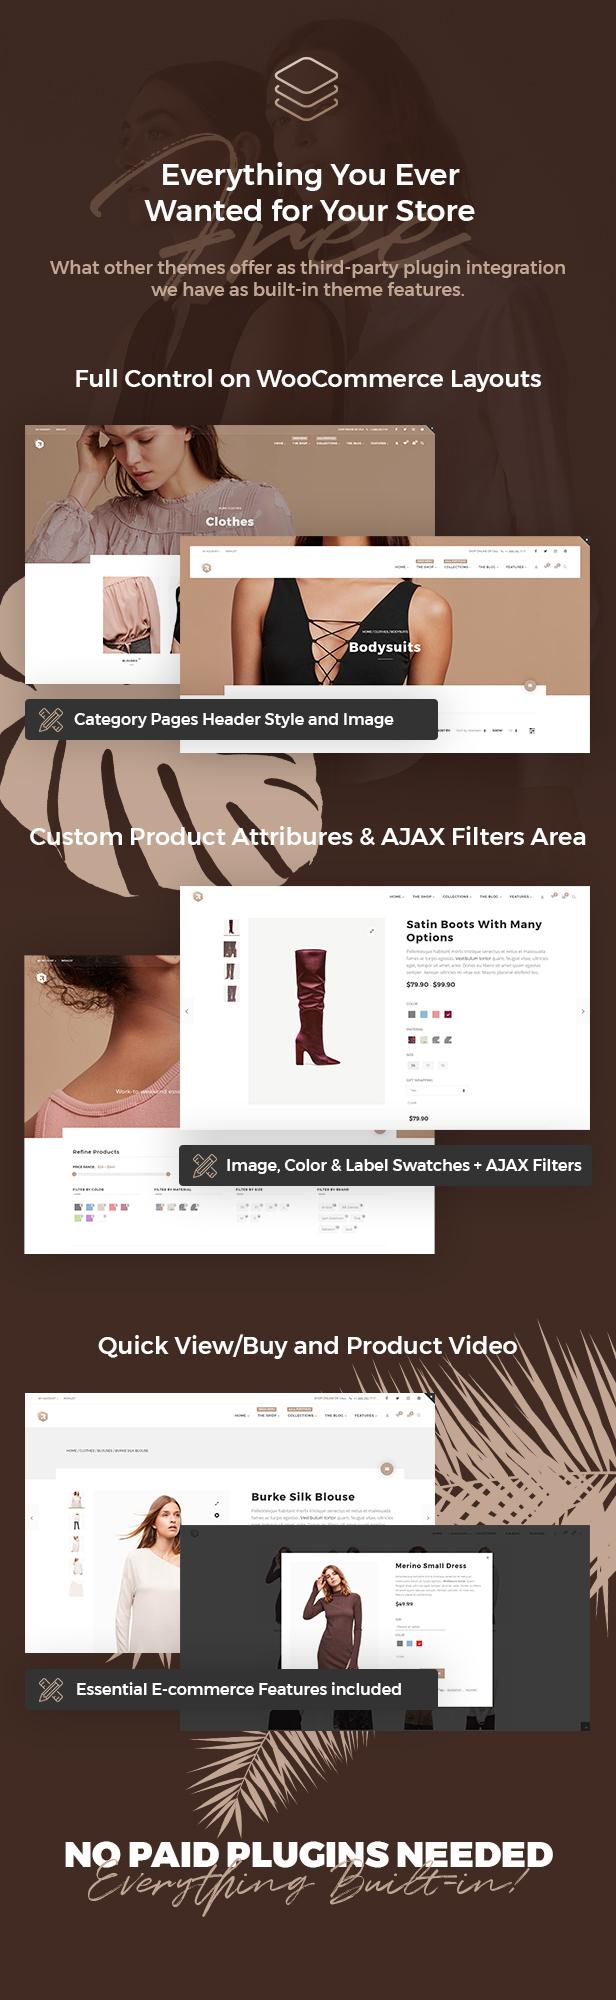 Rigid -  WooCommerce Theme for Enhanced Shops and Multi Vendor Marketplaces - 10